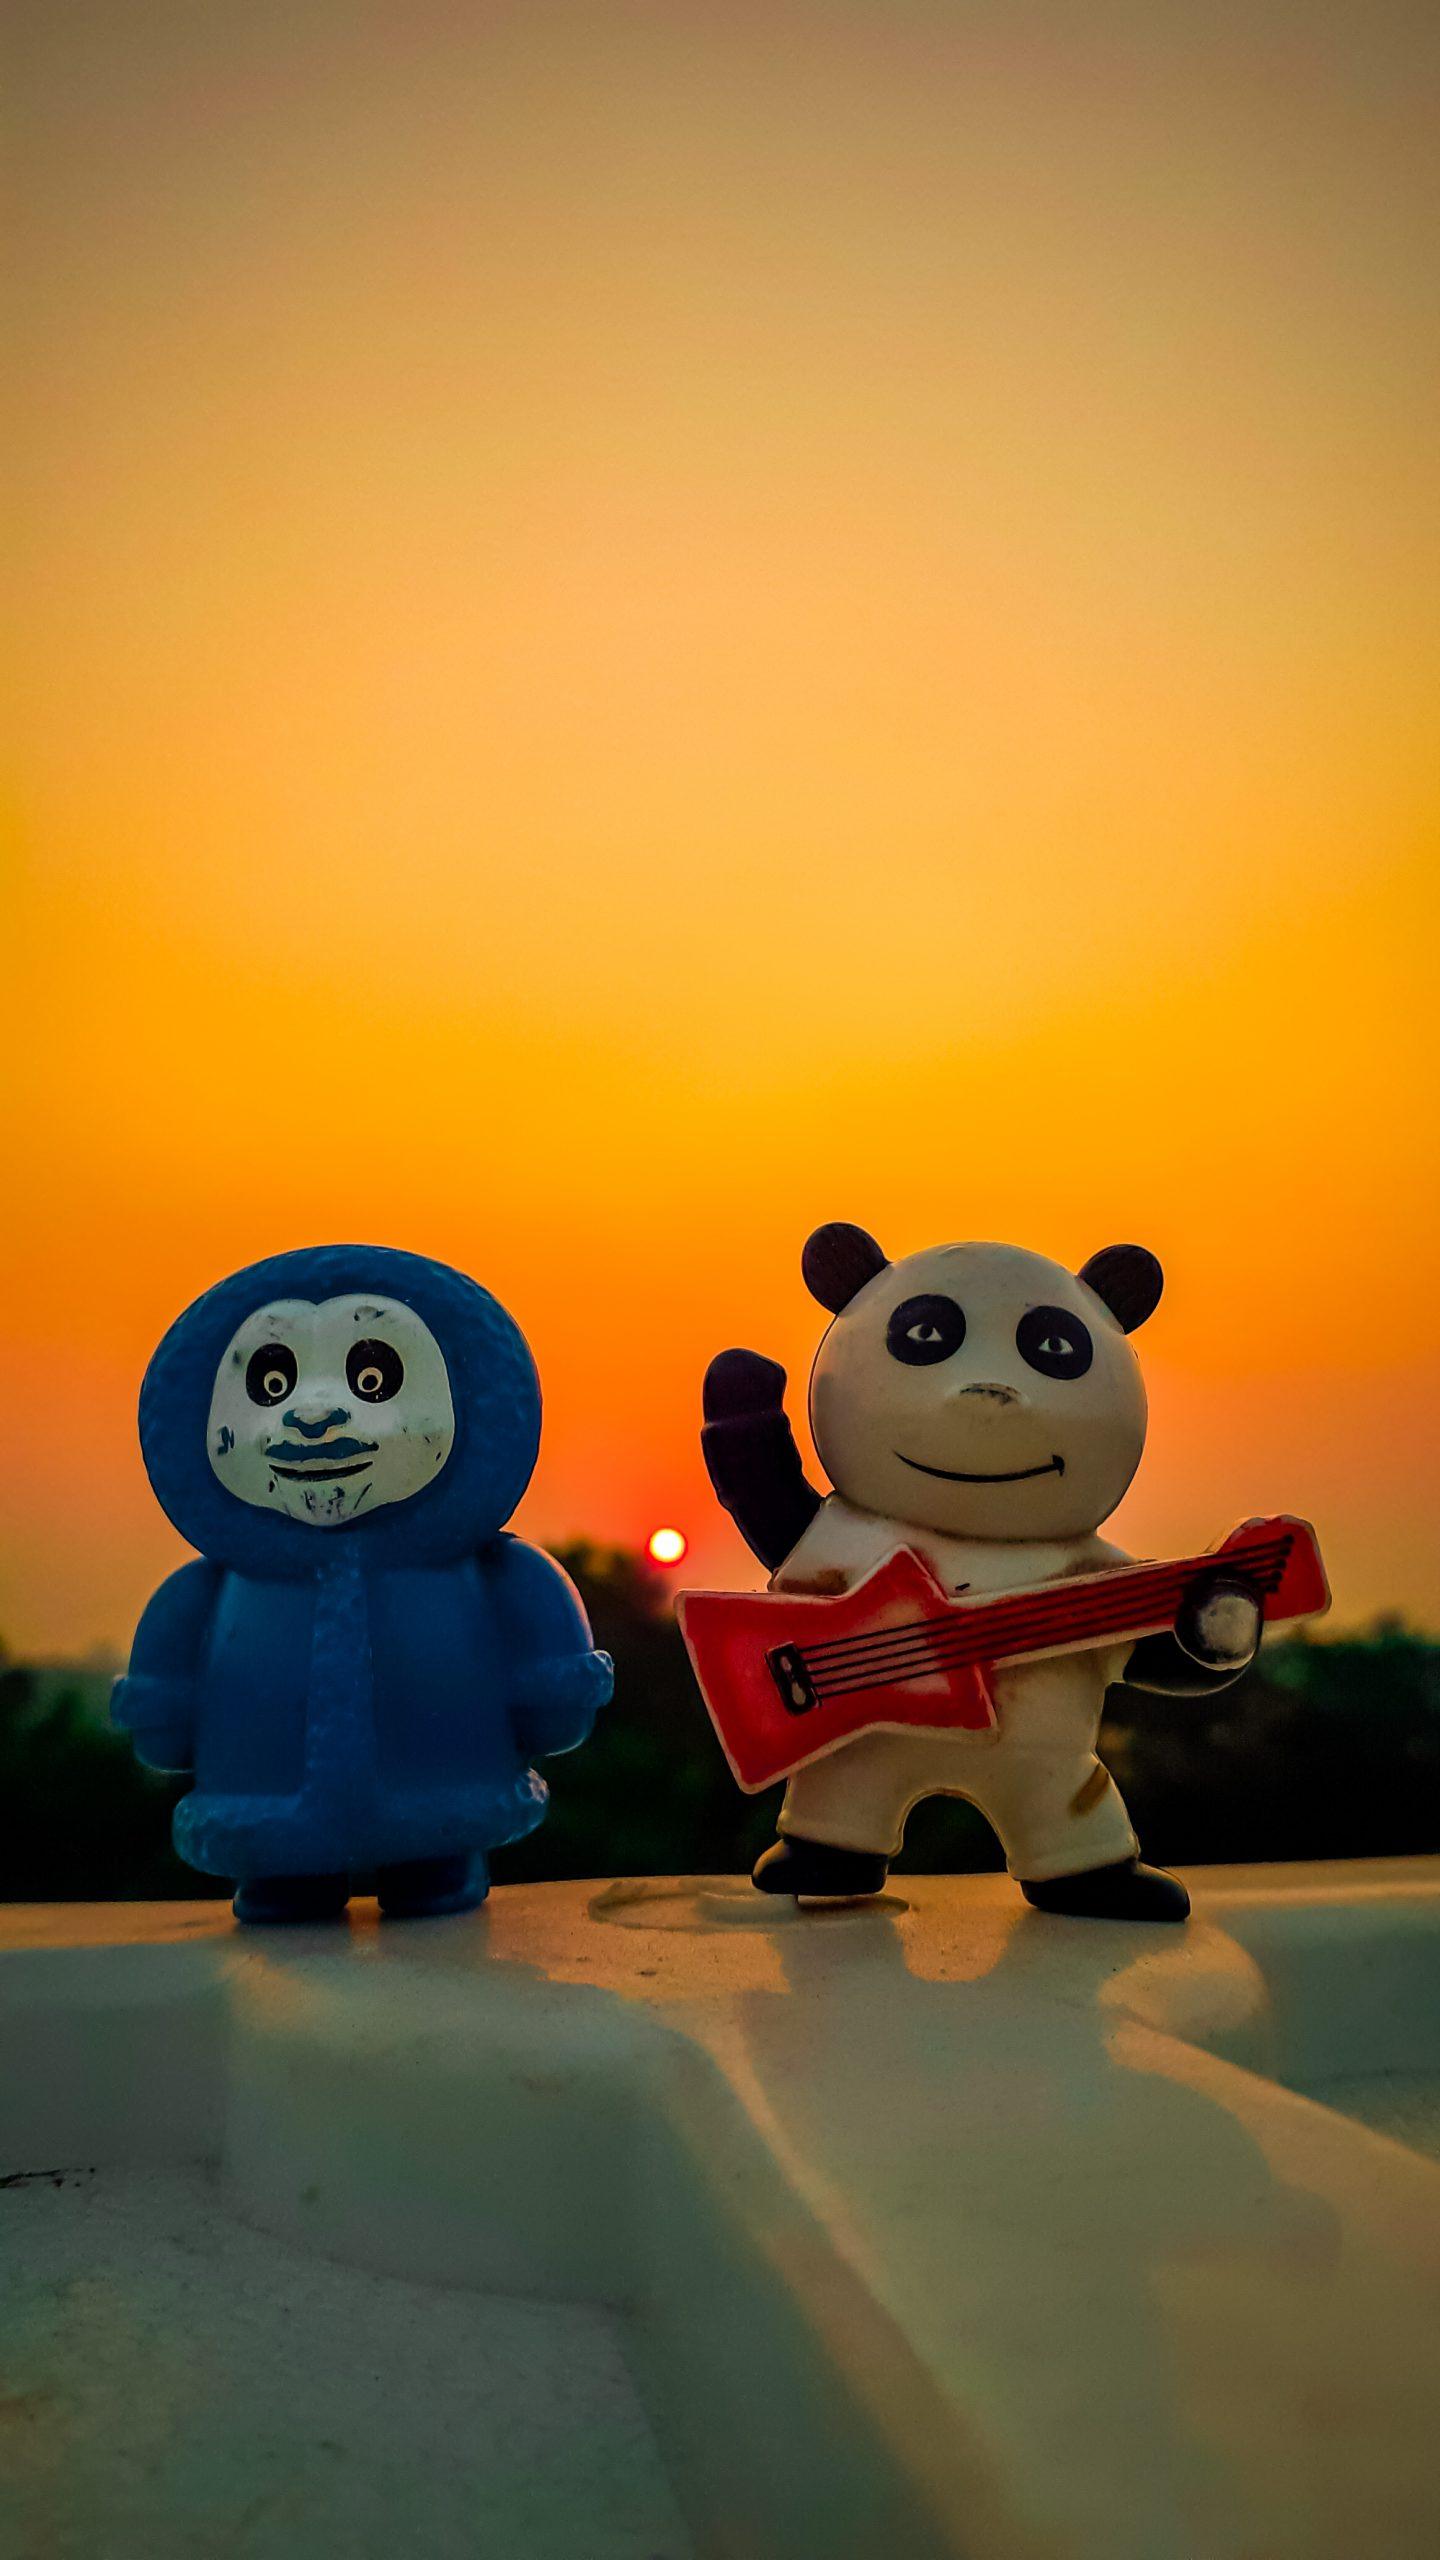 A pair of Panda toys